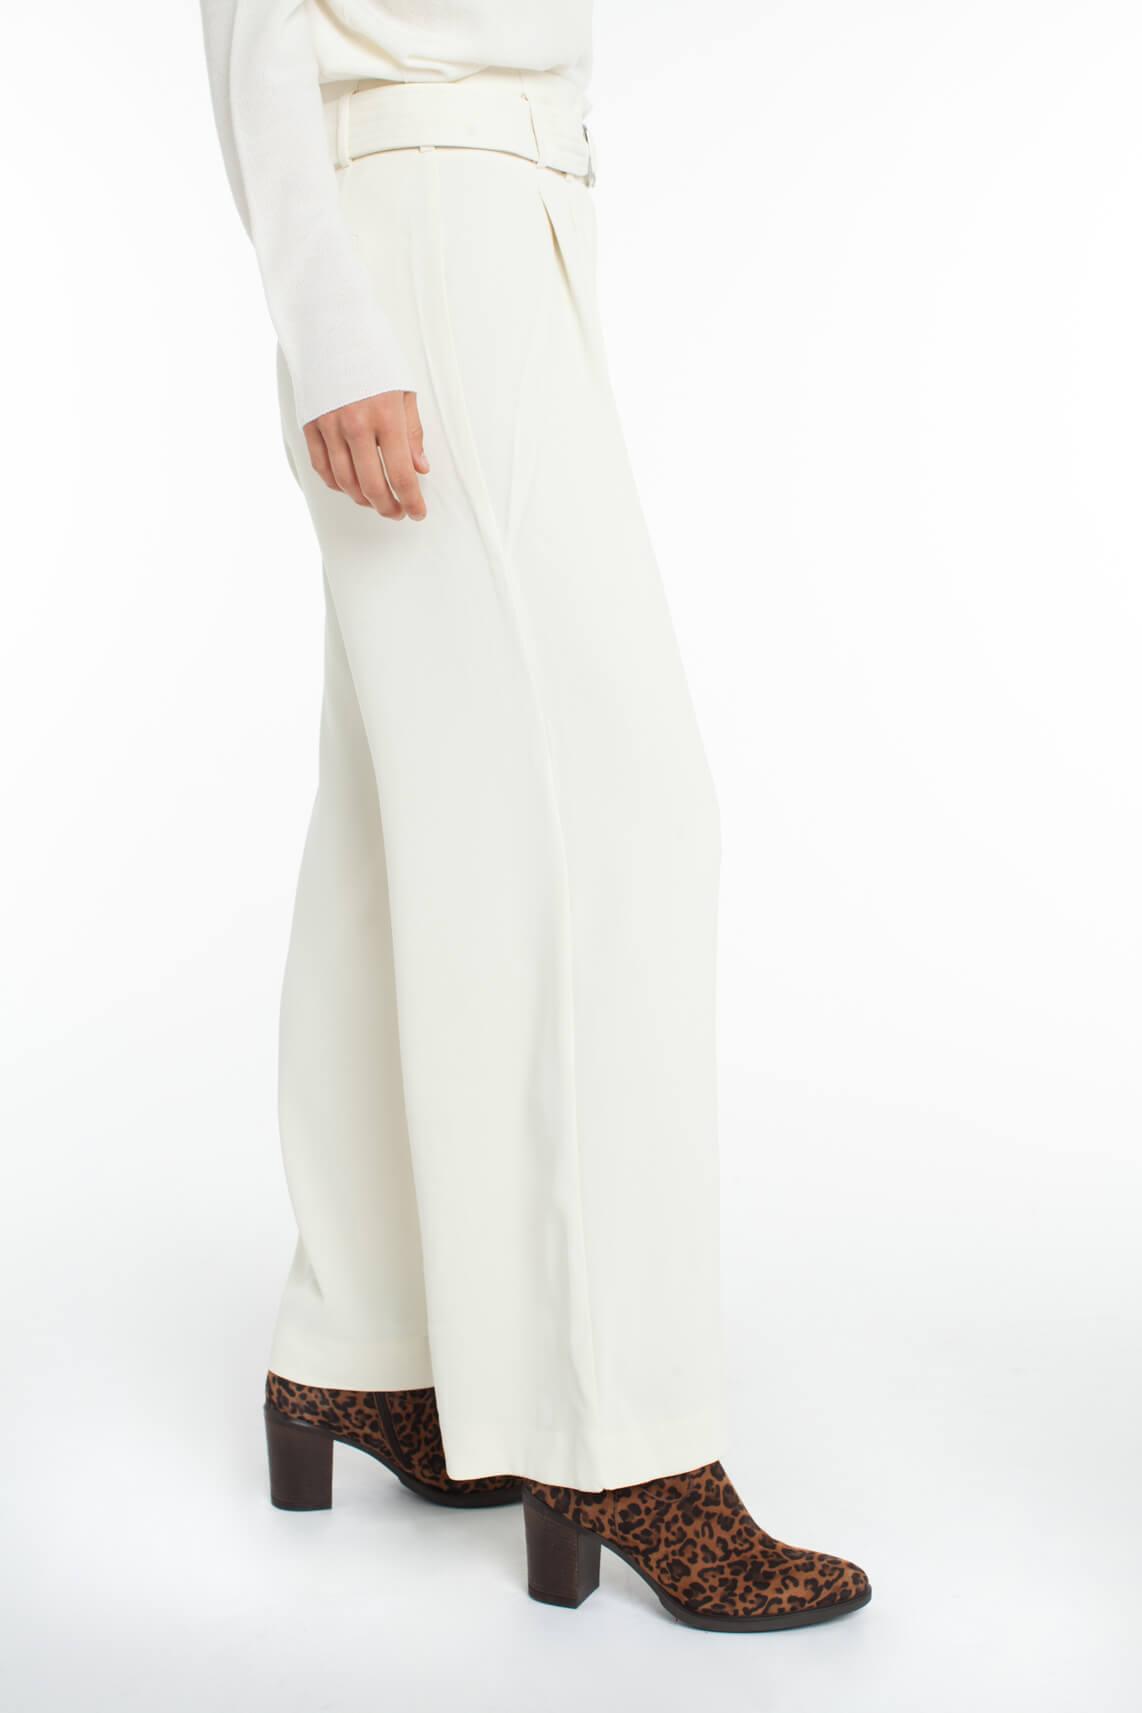 Samsoe Samsoe Dames Mella pantalon wit